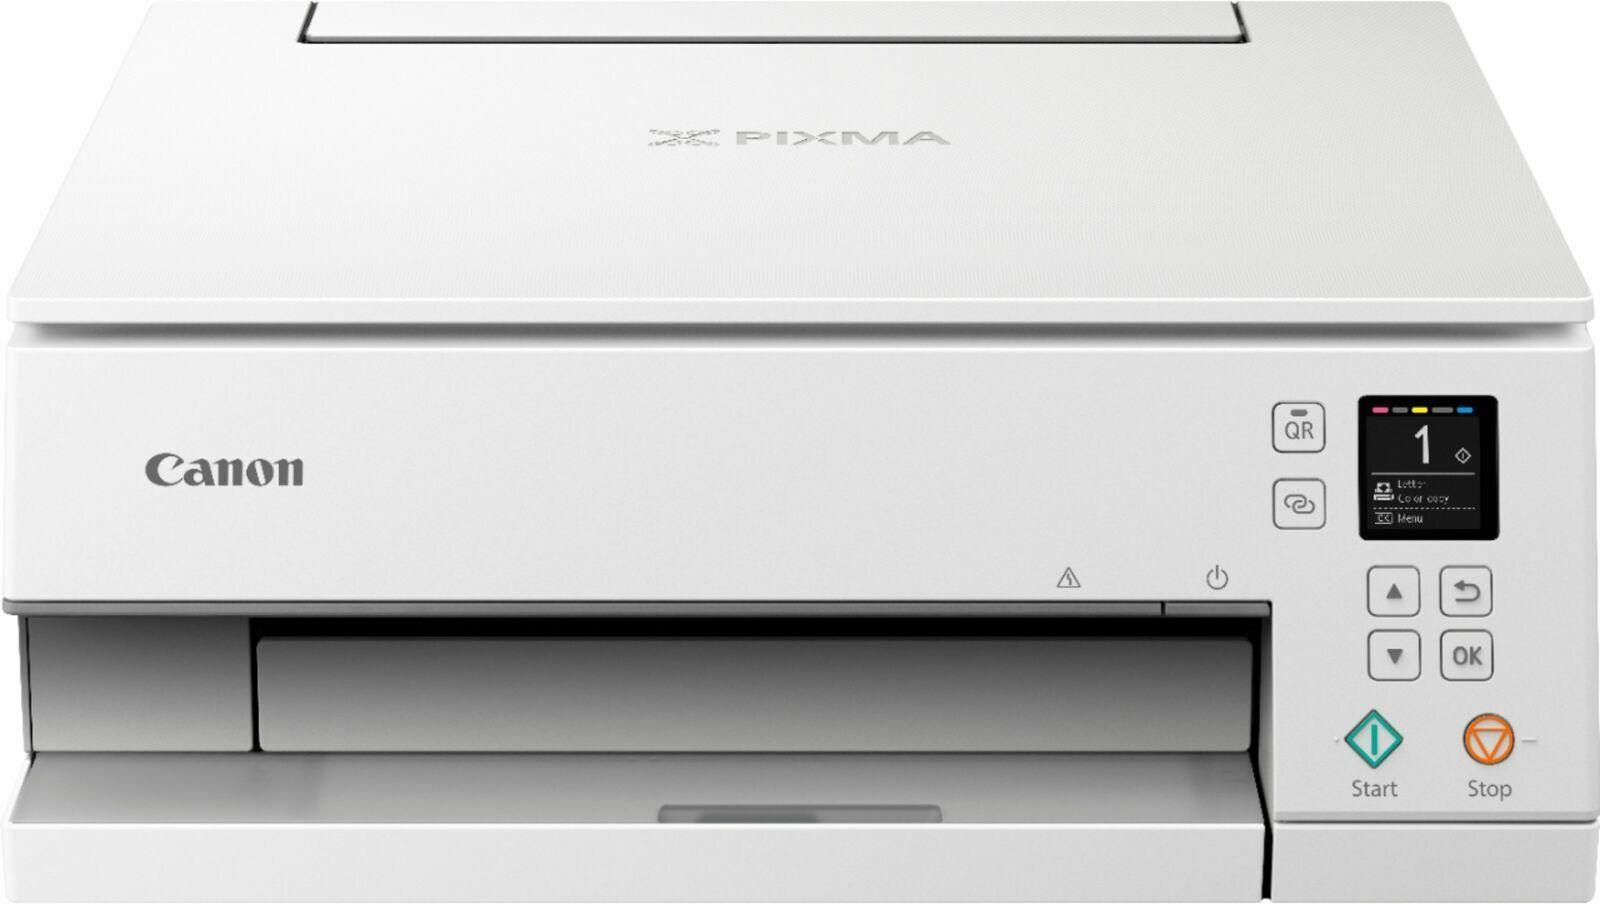 Canon - PIXMA TS6320 Color All-In-One Inkjet Printer - White